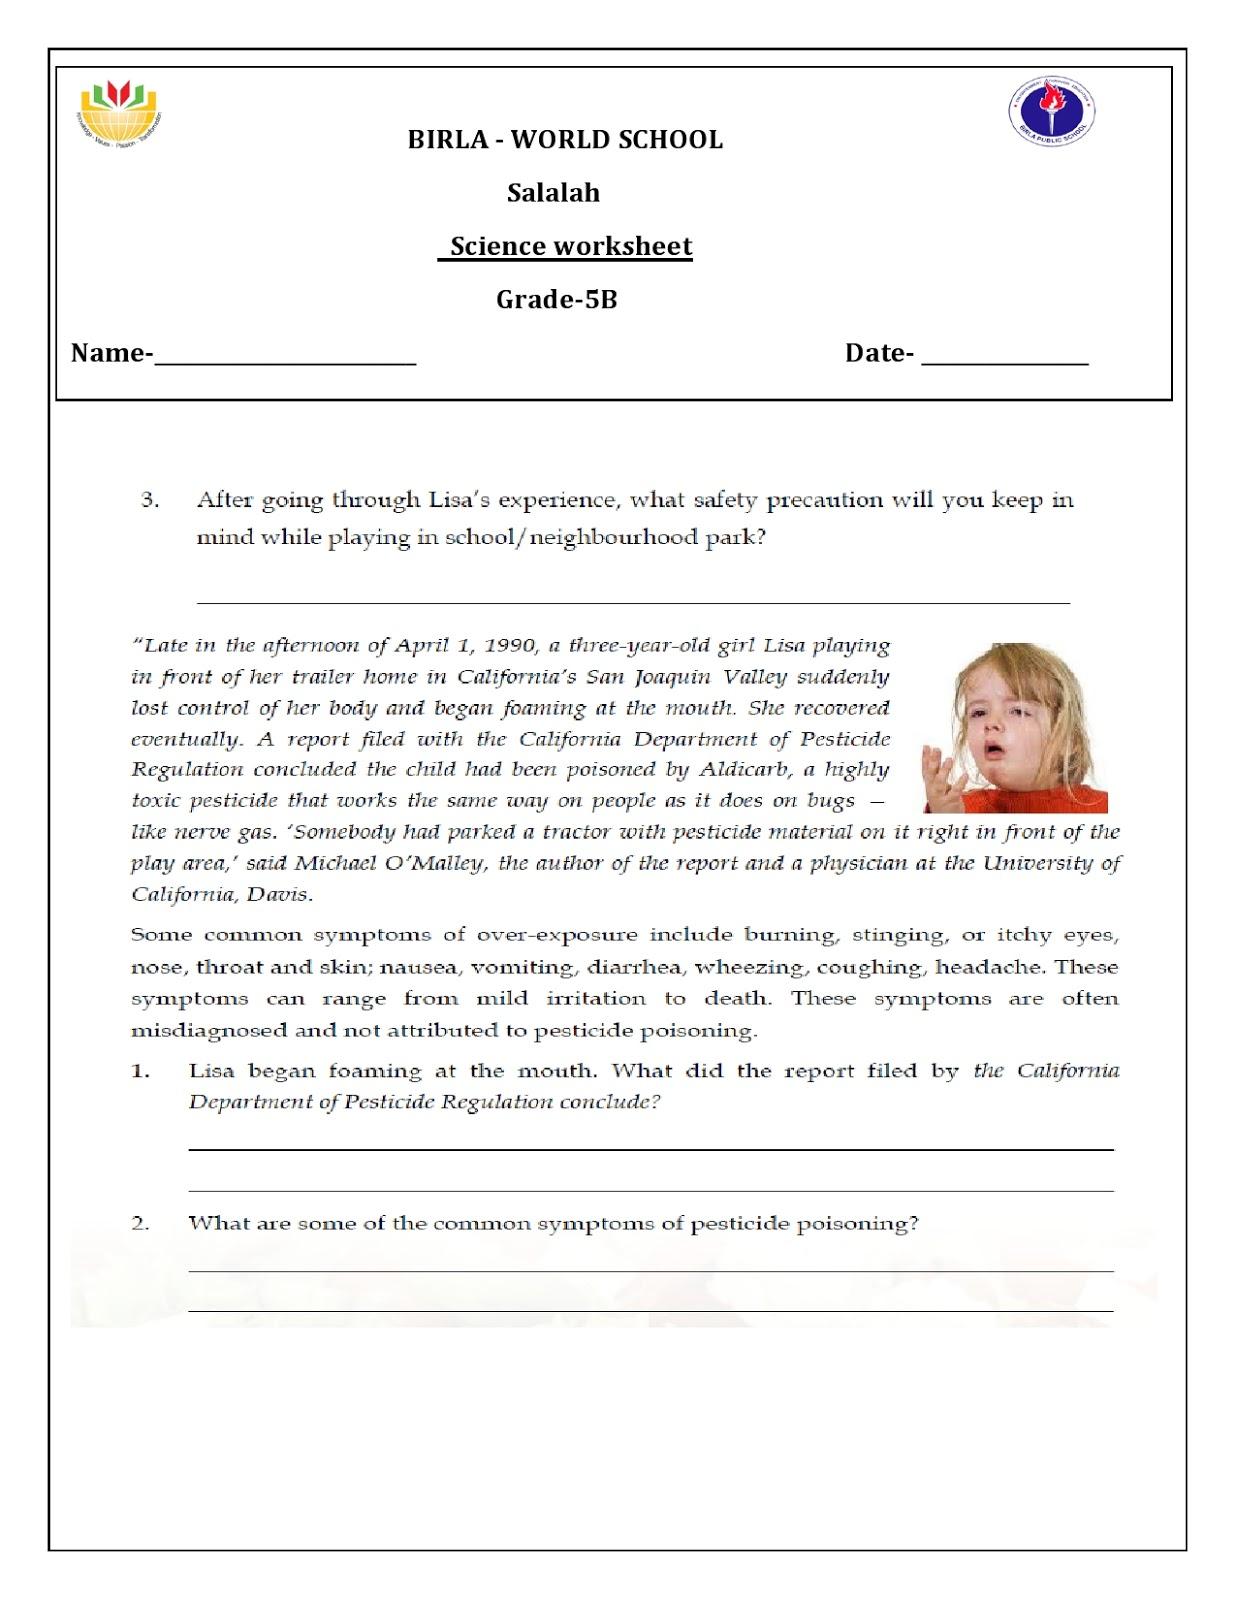 Birla World School Oman Homework For Grade 5 B On 10 11 16